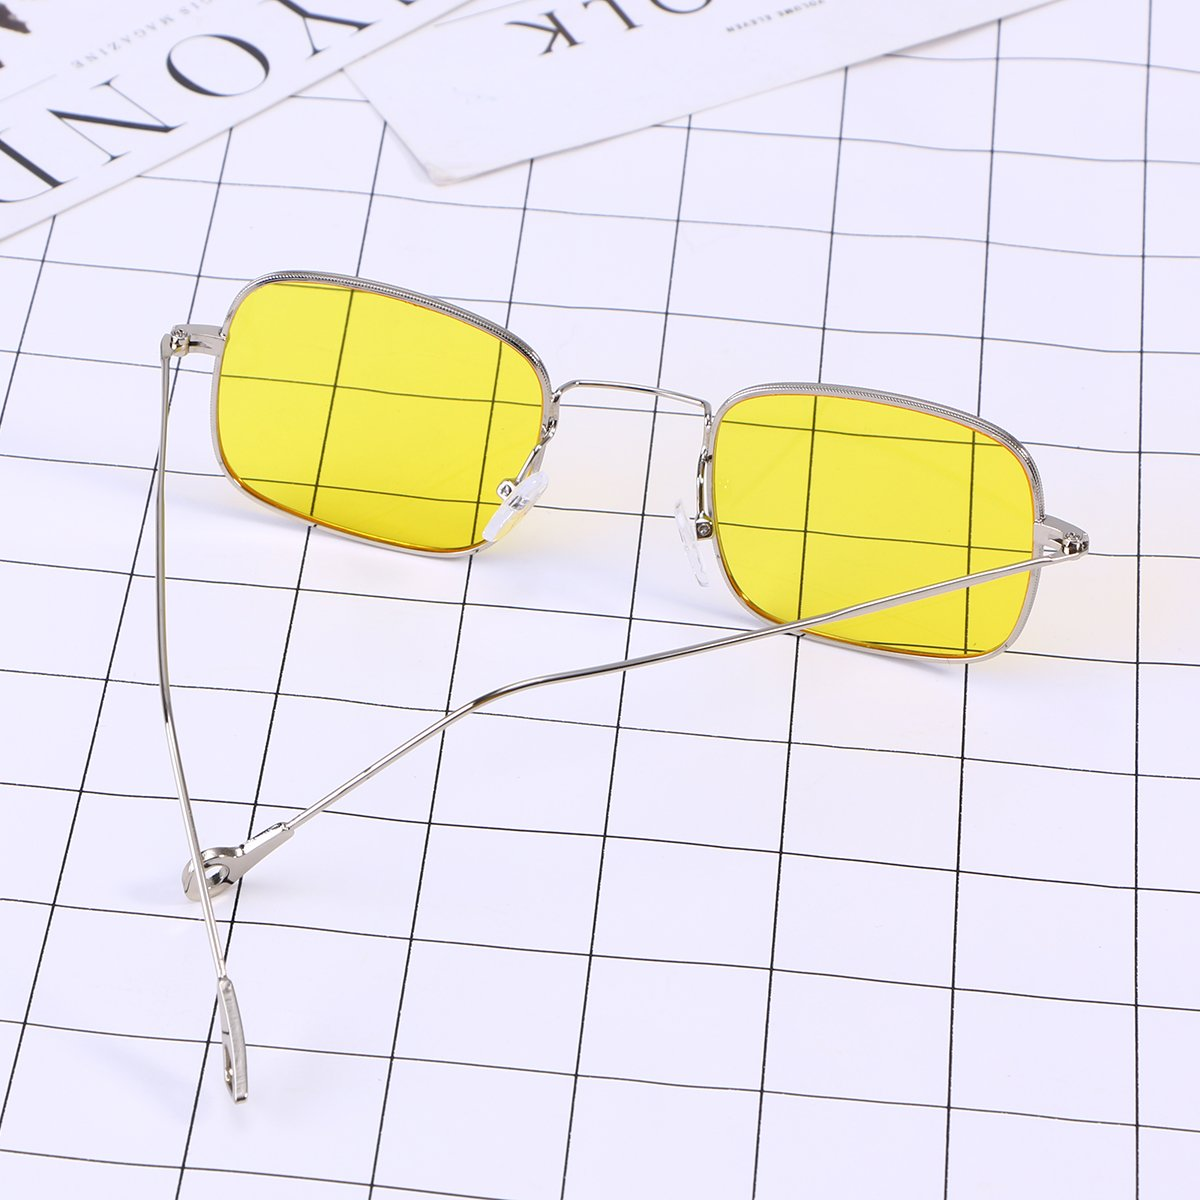 db28cf059538 OULII Vintage Stylish Sunglasses Small Square Ocean Film Eyeglasses  (Yellow): Amazon.co.uk: Clothing